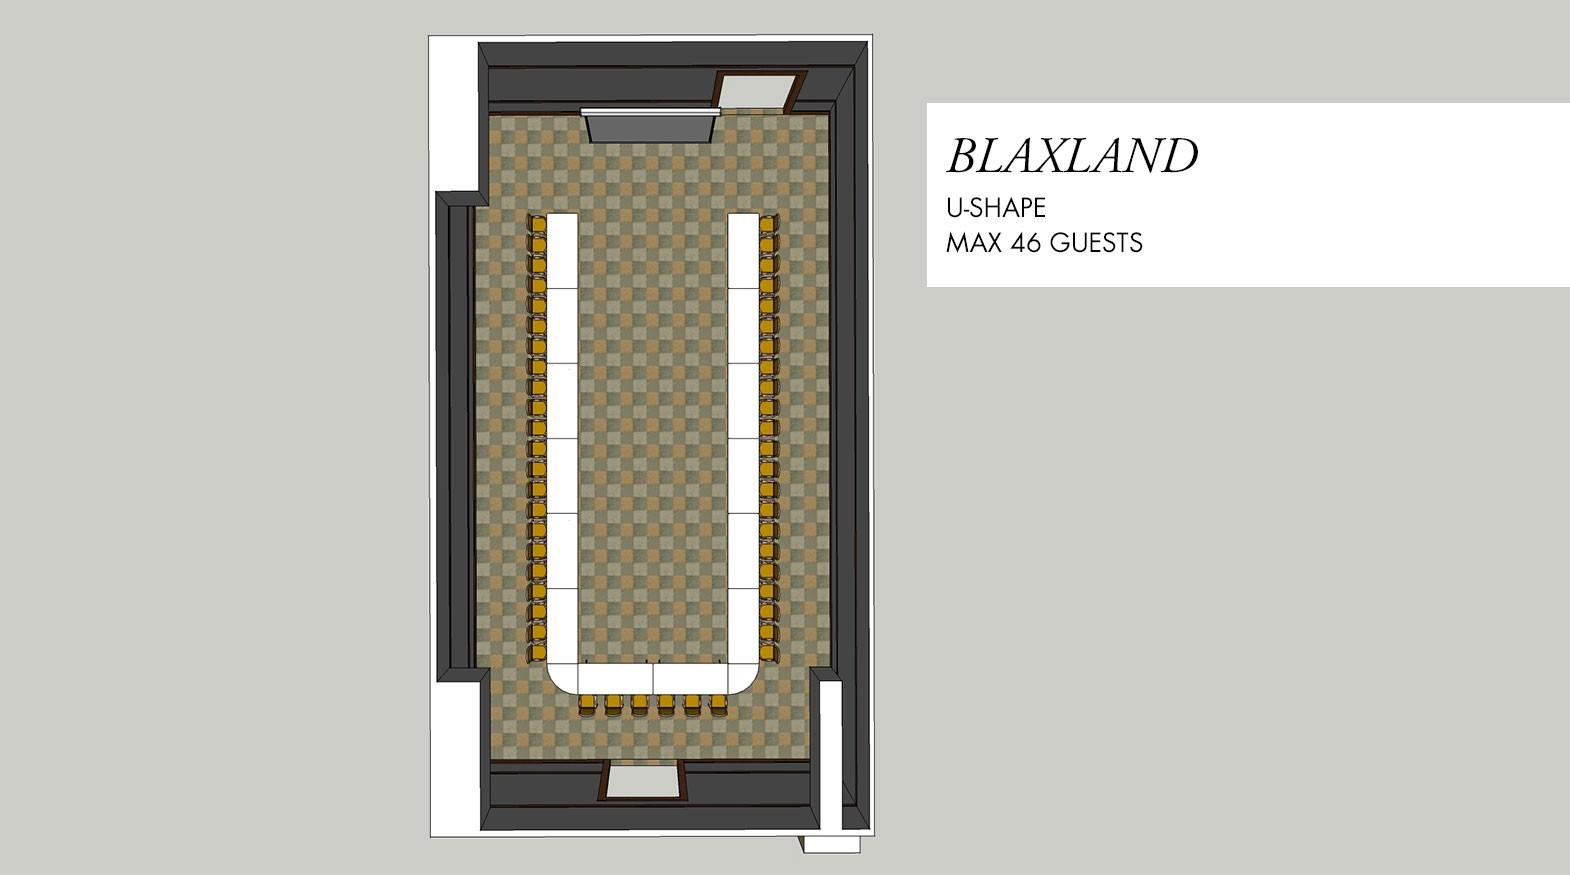 Blaxland-u-shape1.jpg